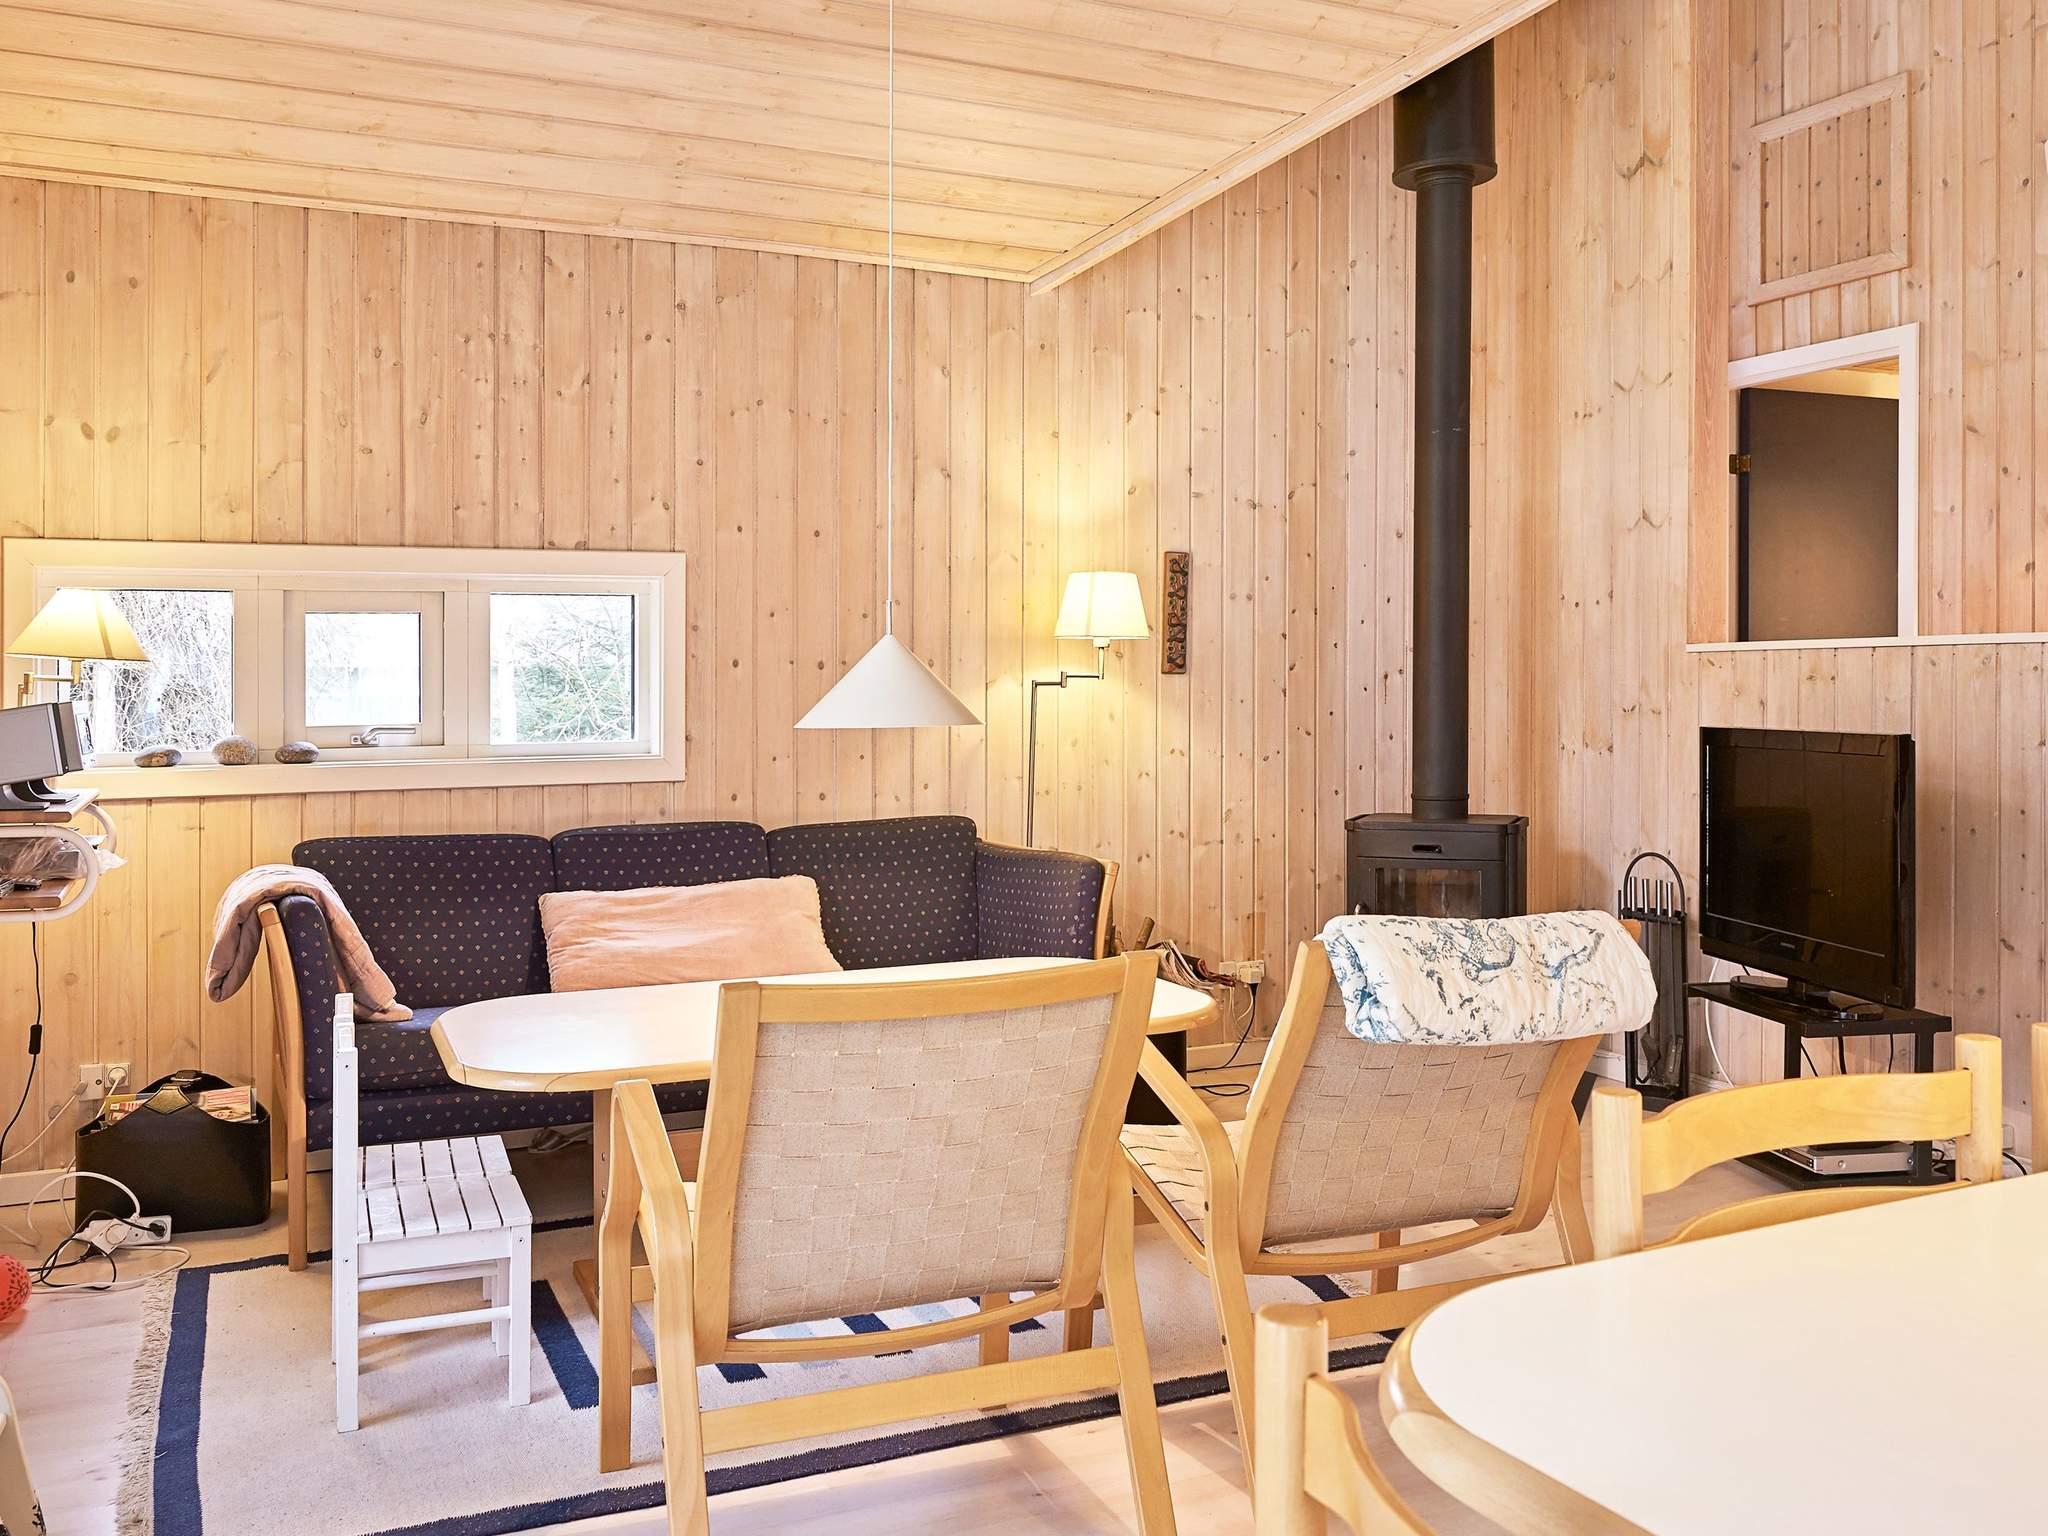 Ferienhaus Østre Sømarken (82542), Aakirkeby, , Bornholm, Dänemark, Bild 2